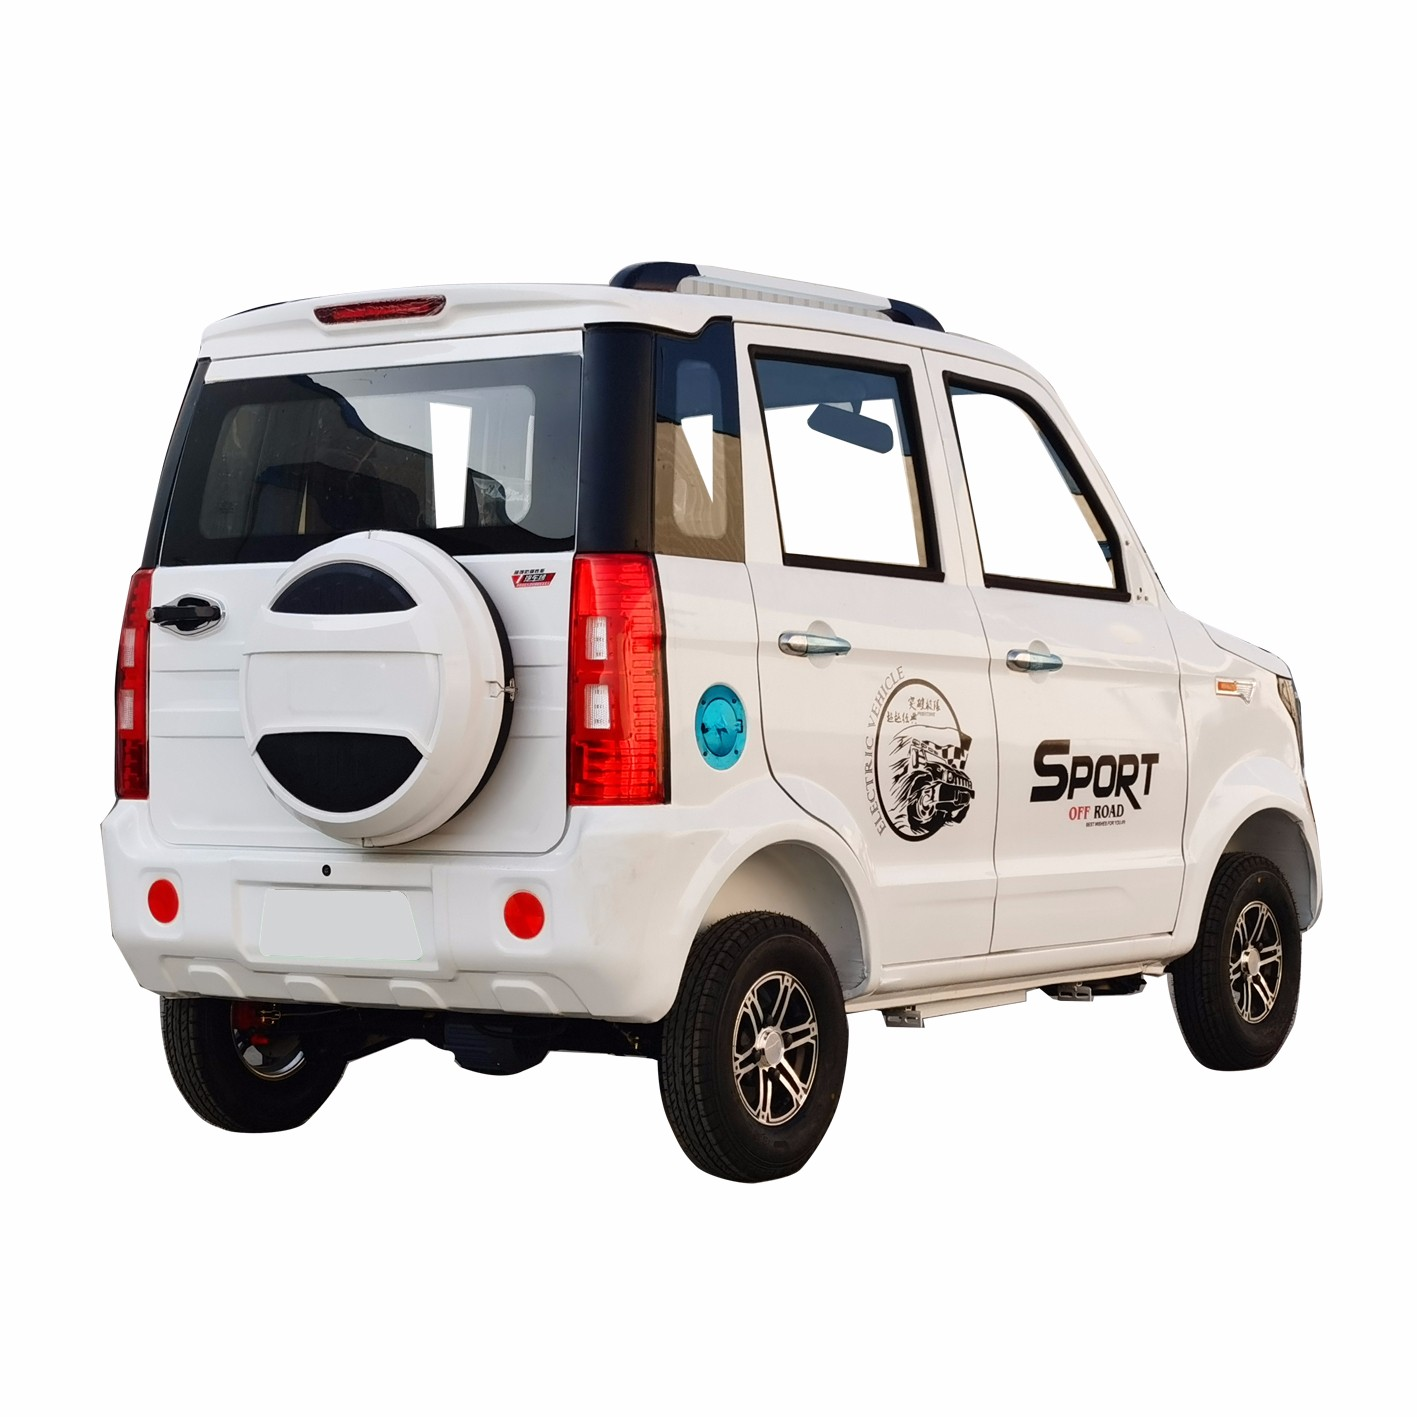 Low Speed Jeep Shape electric car Manufacturers, Low Speed Jeep Shape electric car Factory, Supply Low Speed Jeep Shape electric car